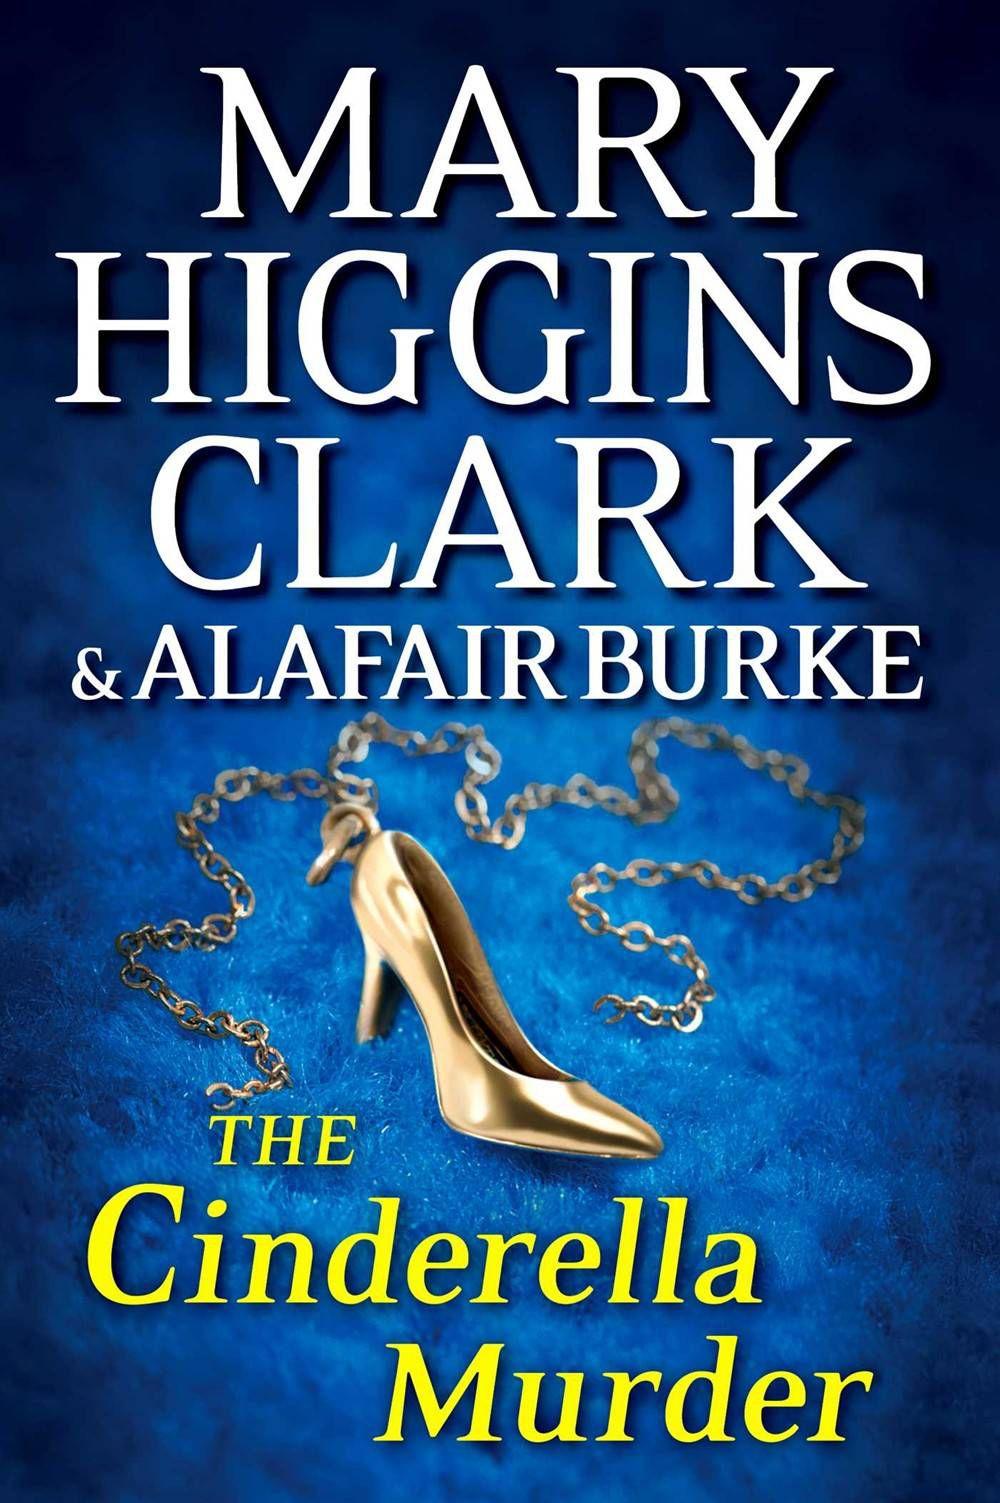 cinderella murder - mary higgins clark alafair burke